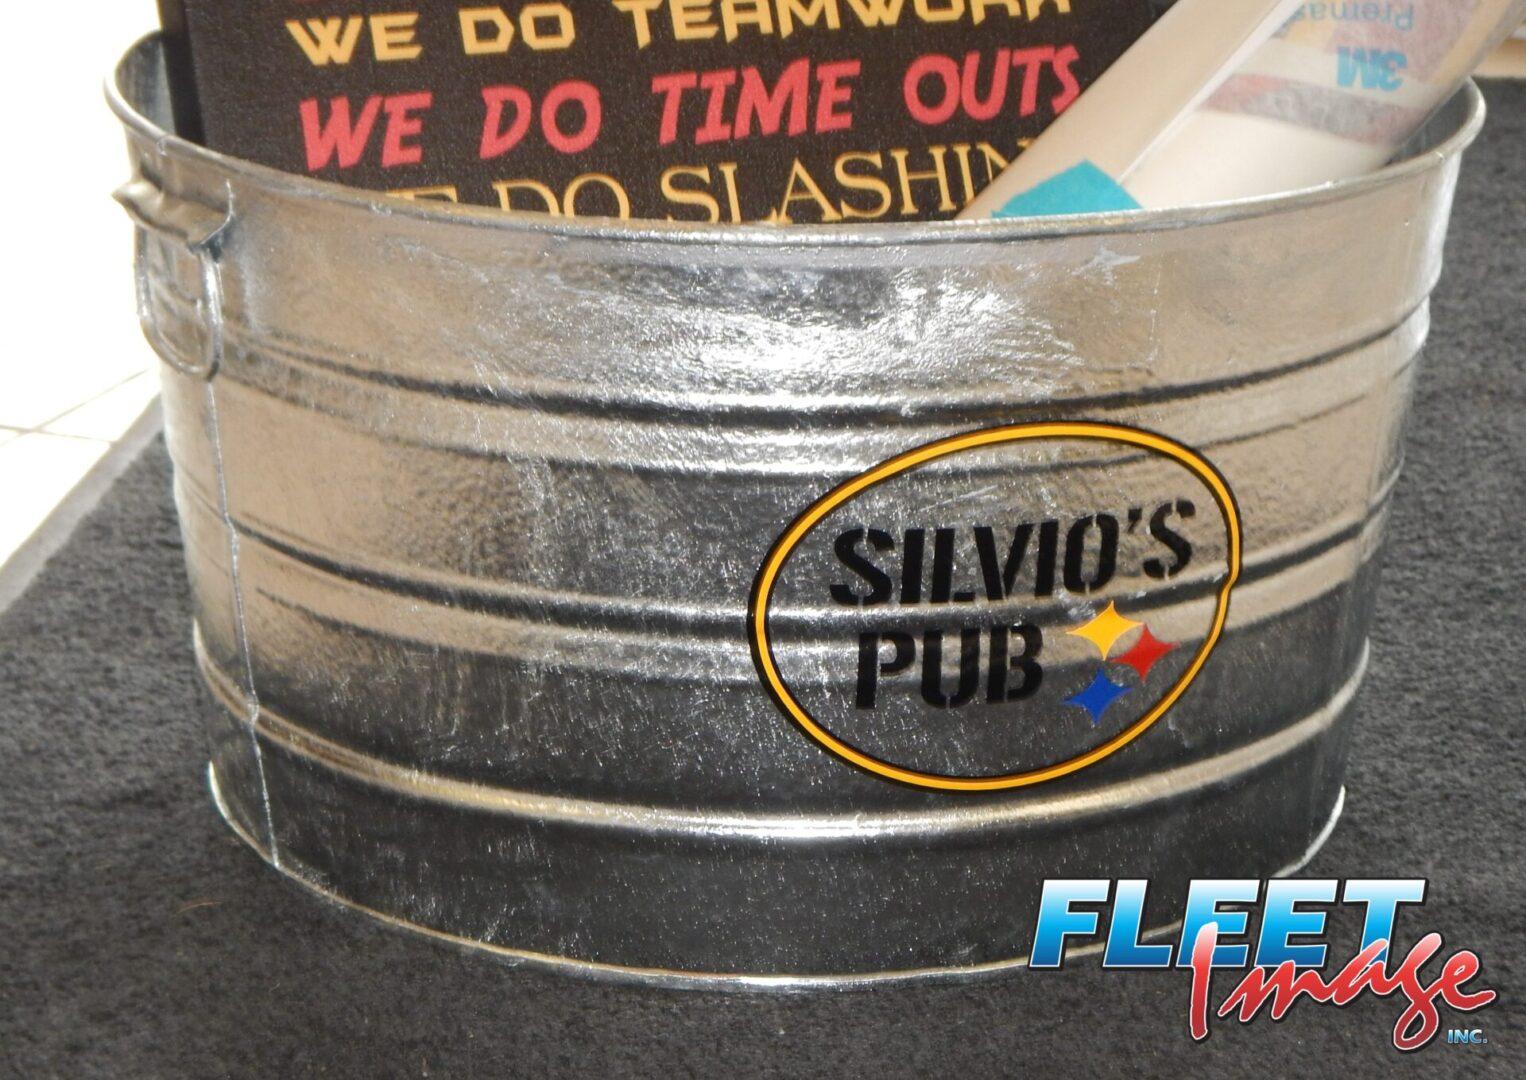 Silvio's Pub sticker on a bucket